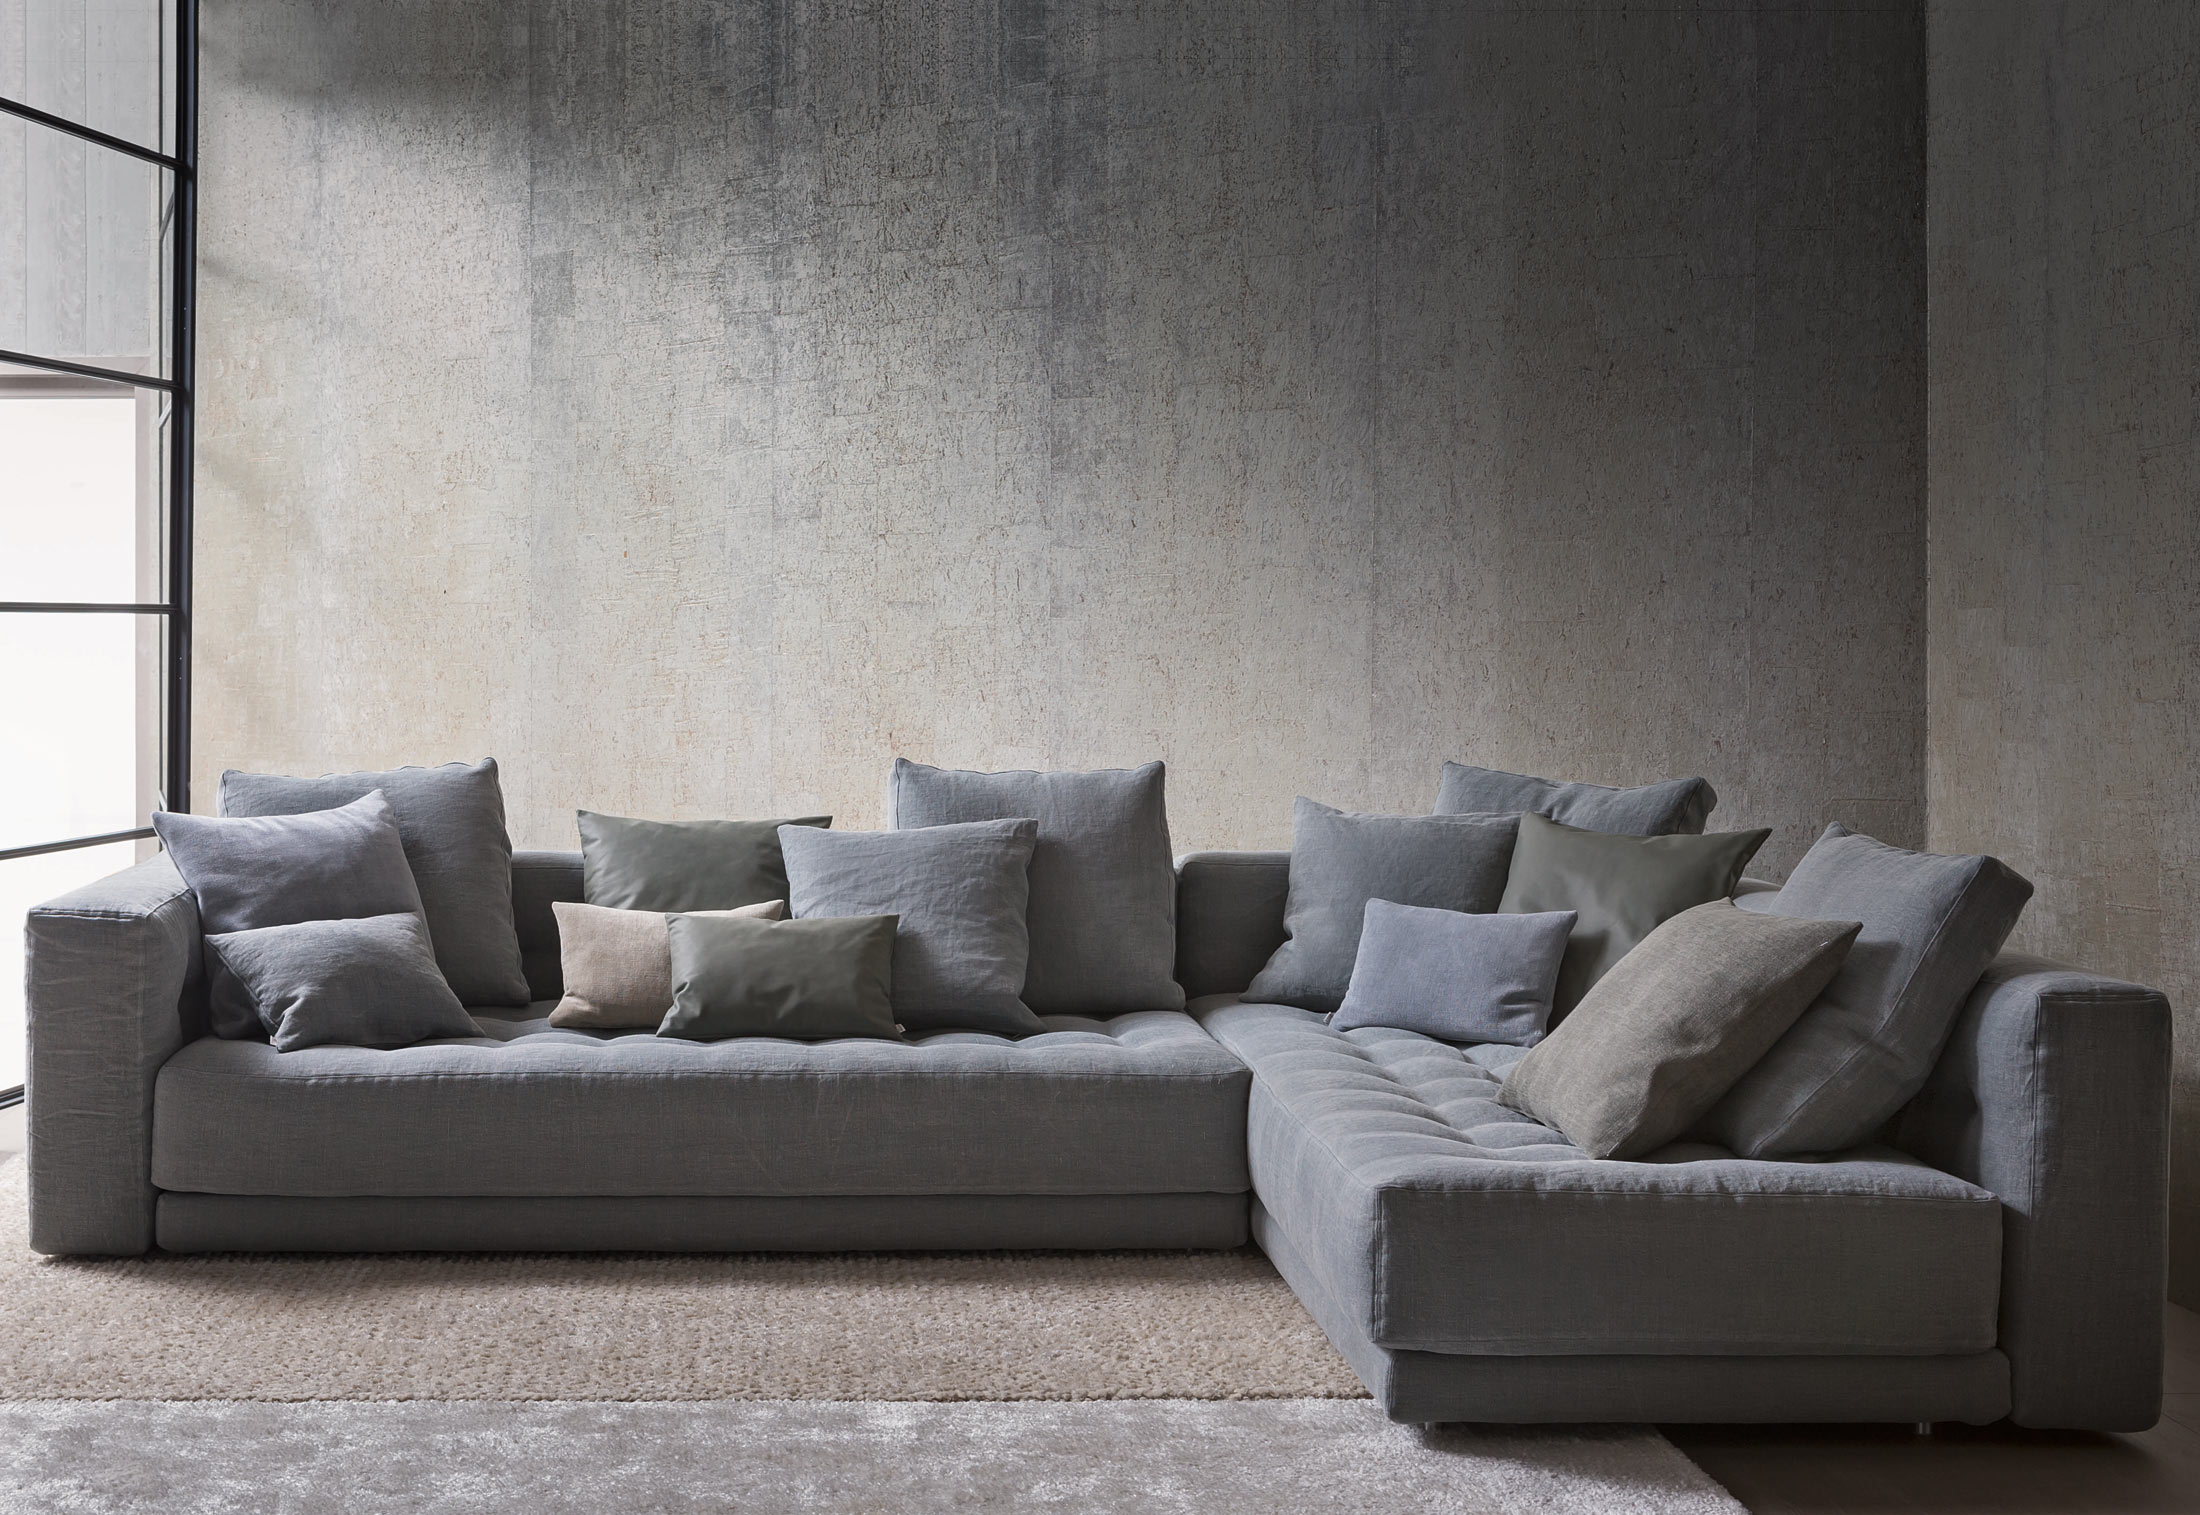 Doze Sofa By Flou Stylepark